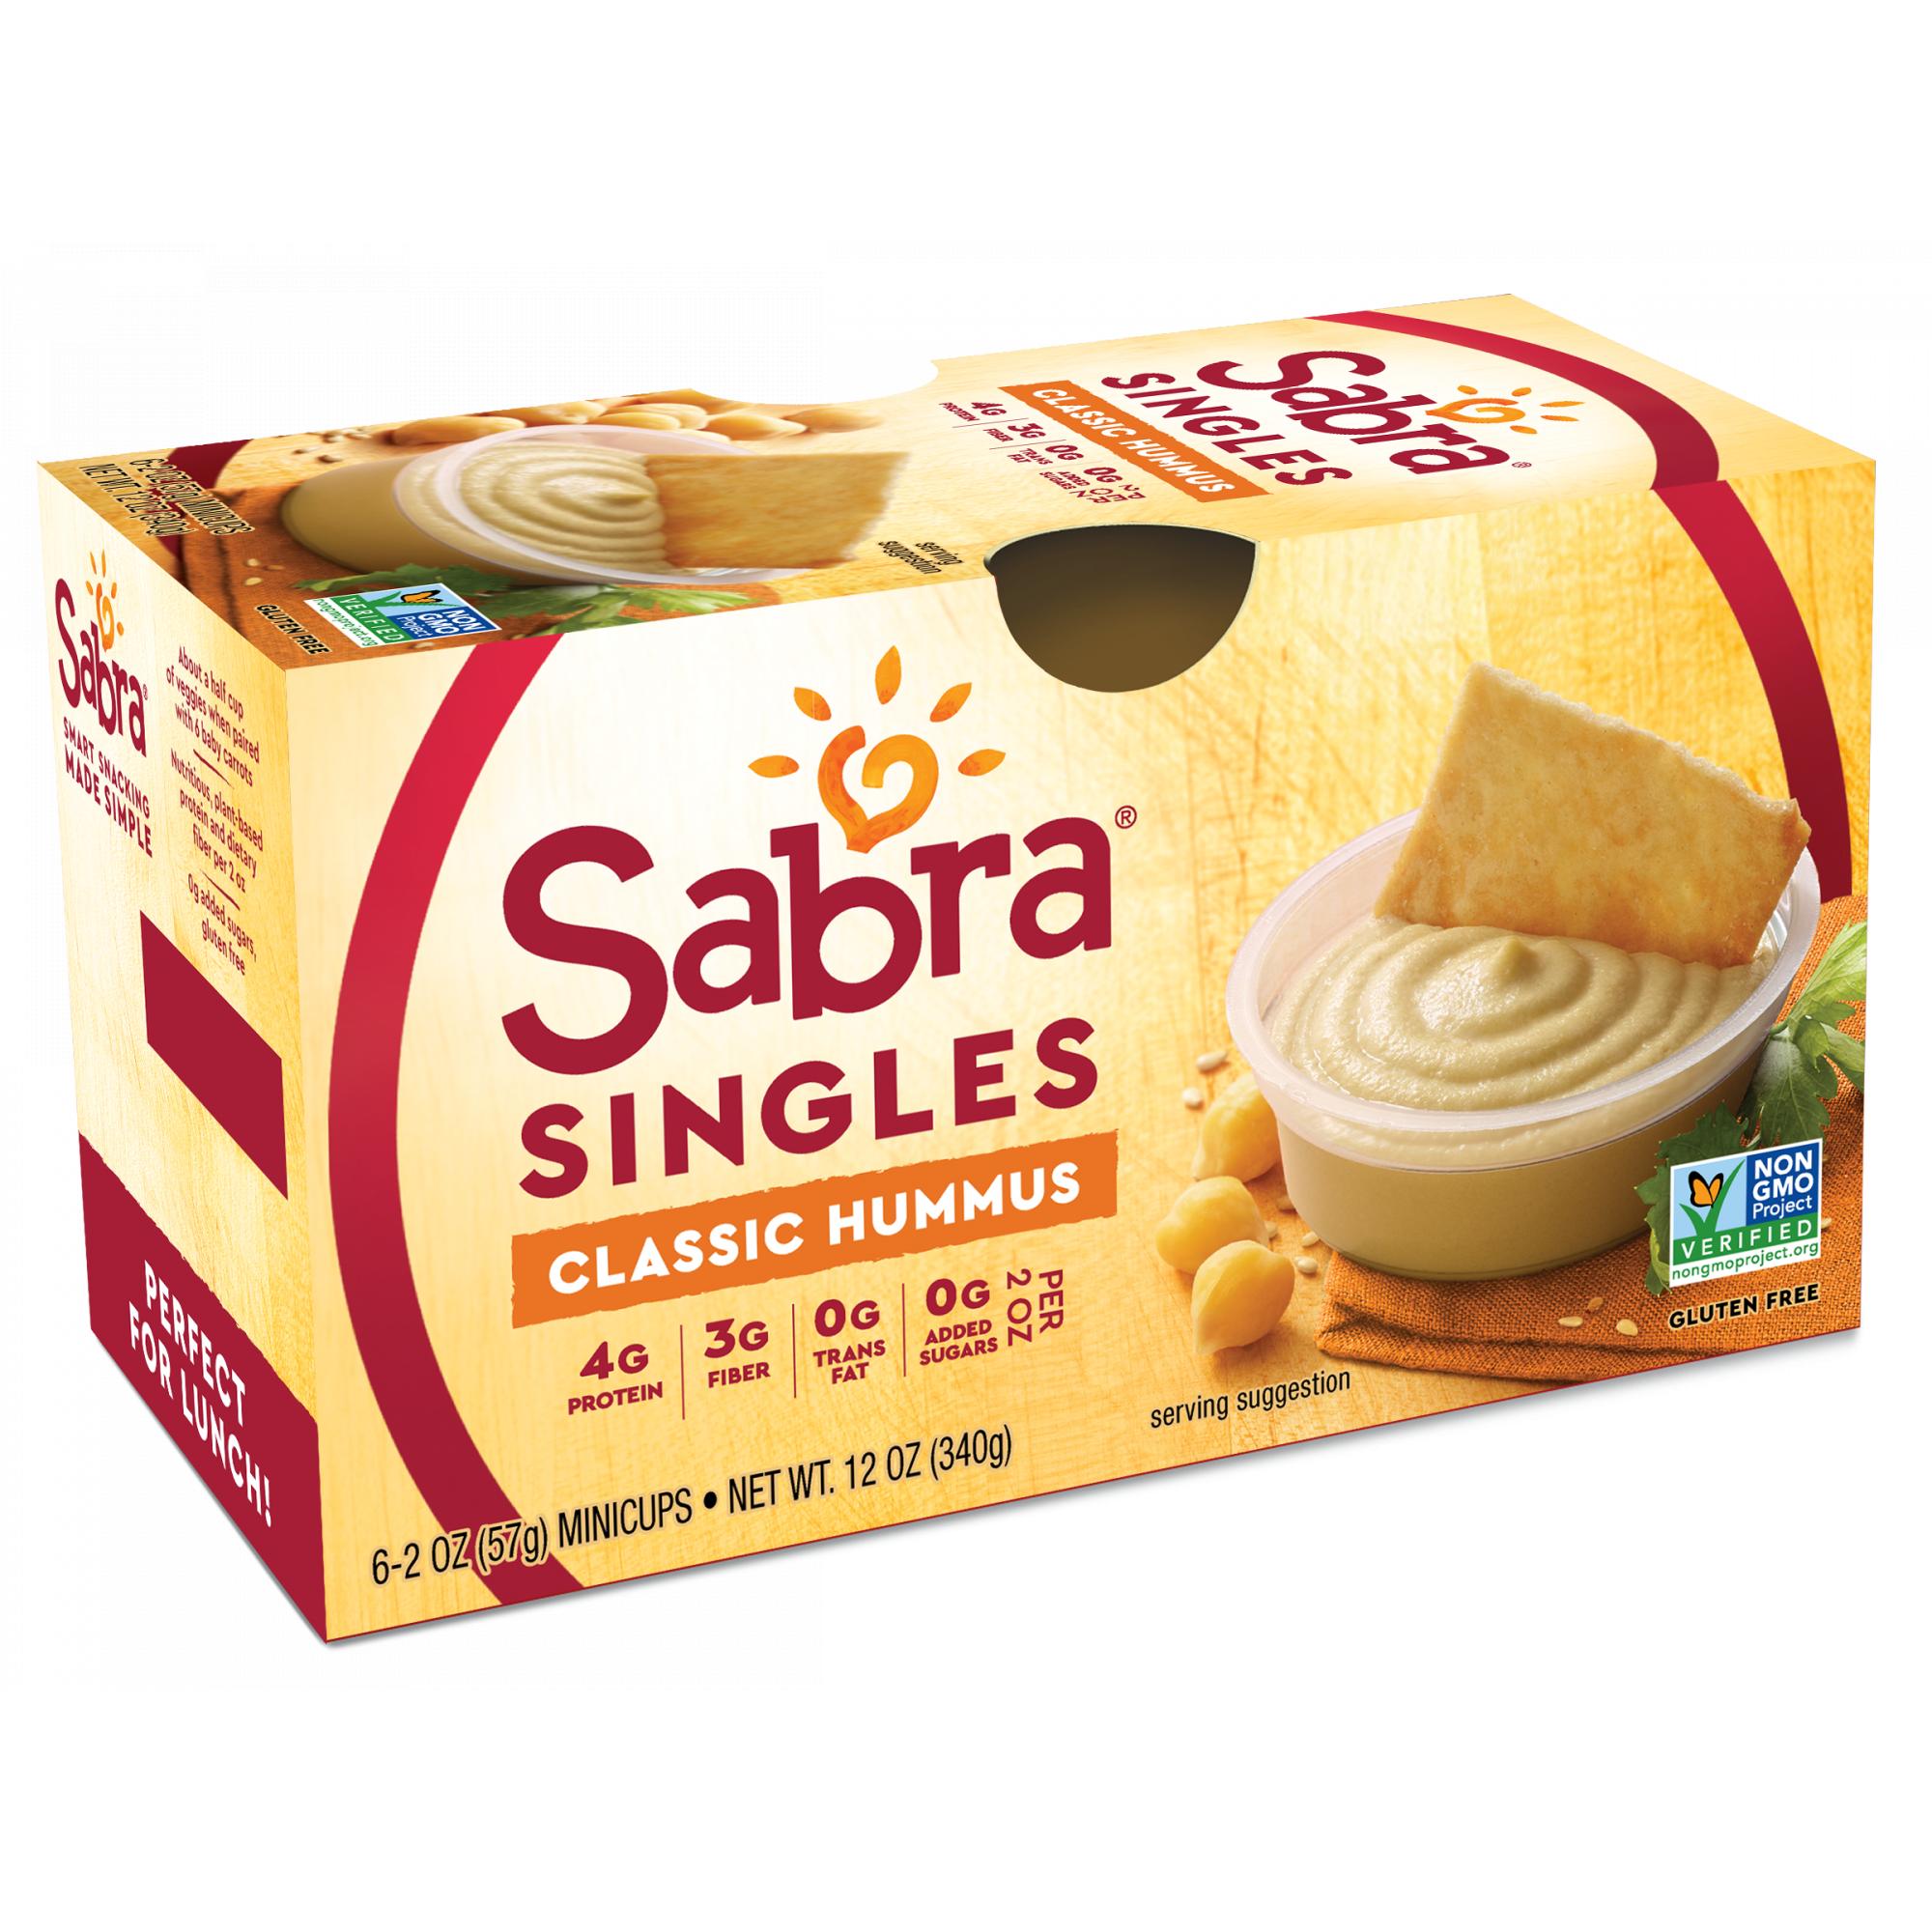 Sabra Hummus Classic 2 oz Cups, 6 Count